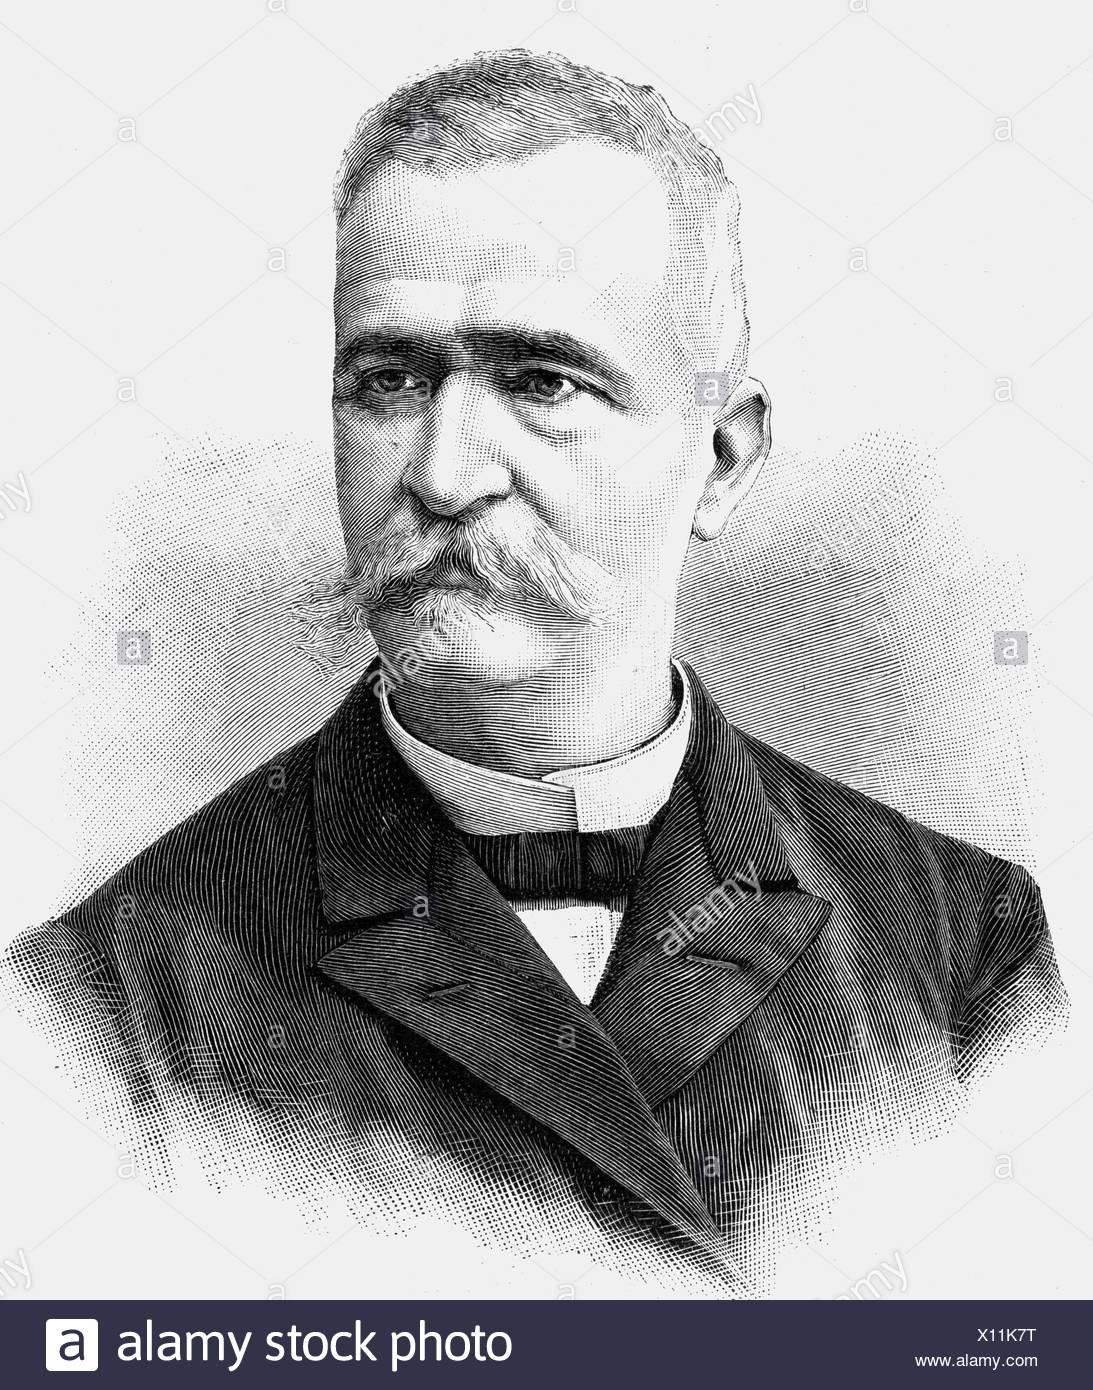 Konstantopulus, Konstantin, * 1832, Greek politician, portrait, wood engraving, Additional-Rights-Clearances-NA - Stock Image